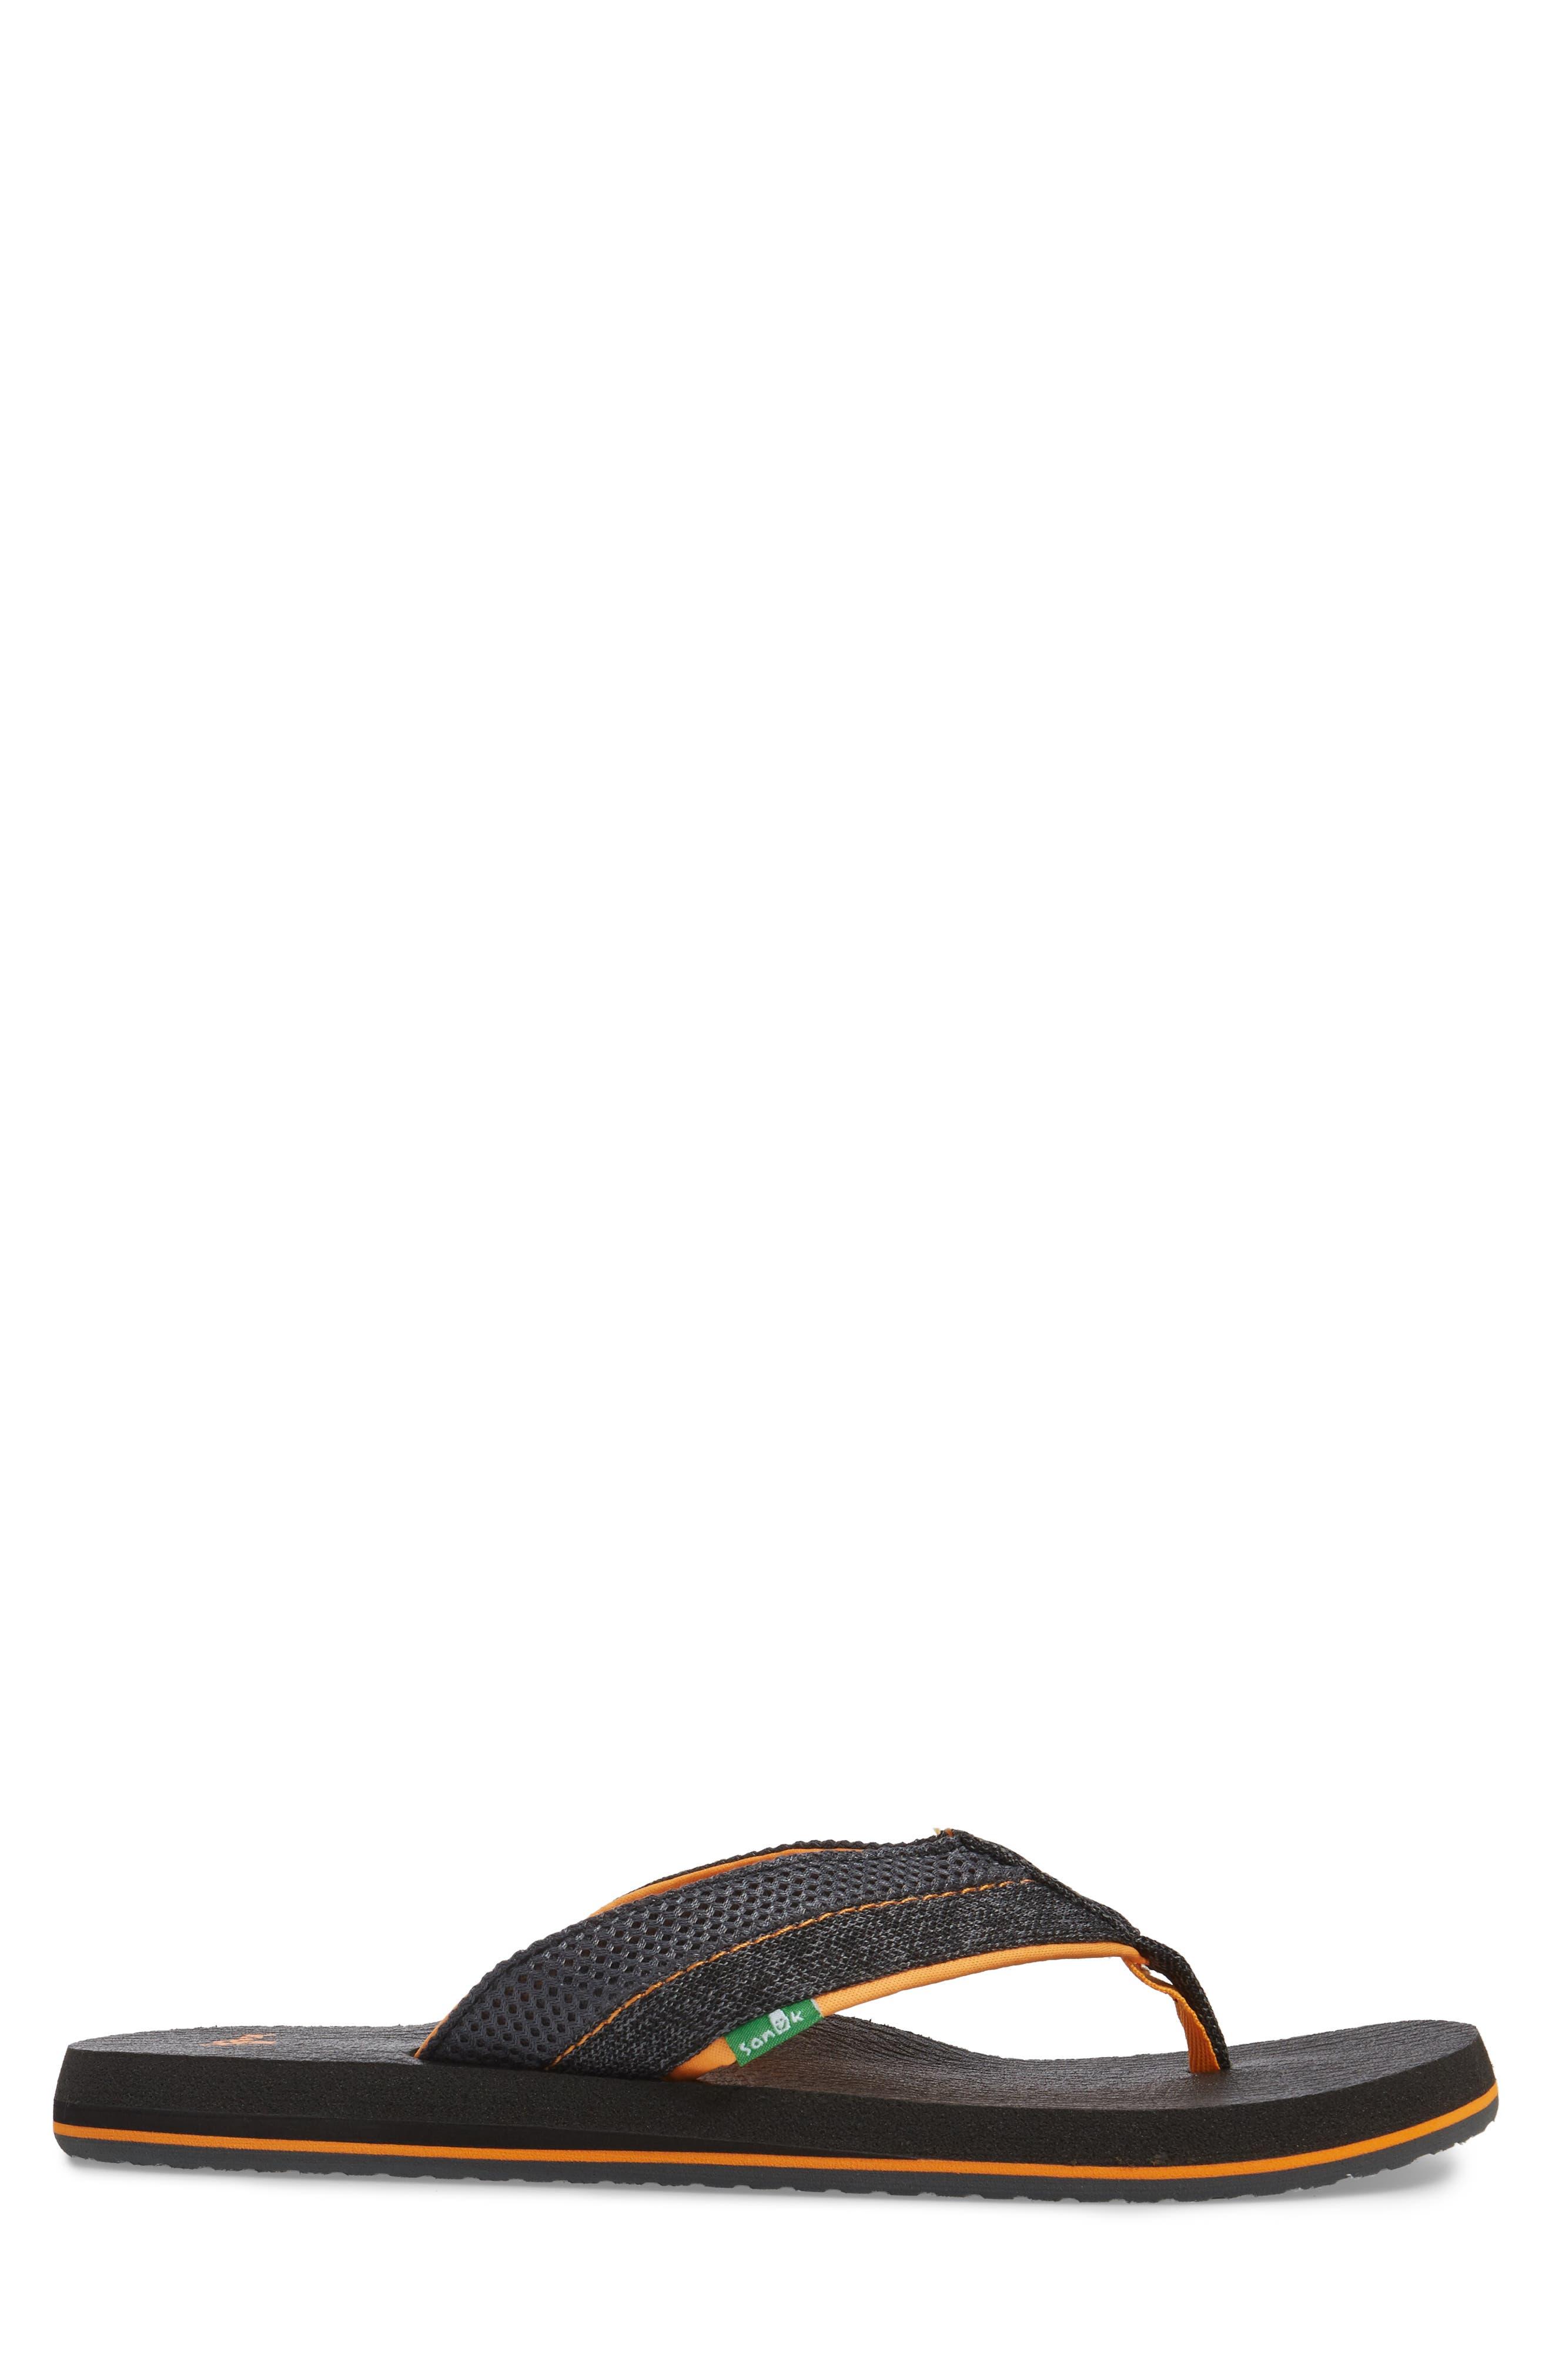 Beer Cozy Flip Flop,                             Alternate thumbnail 3, color,                             Black/ Charcoal/ Orange